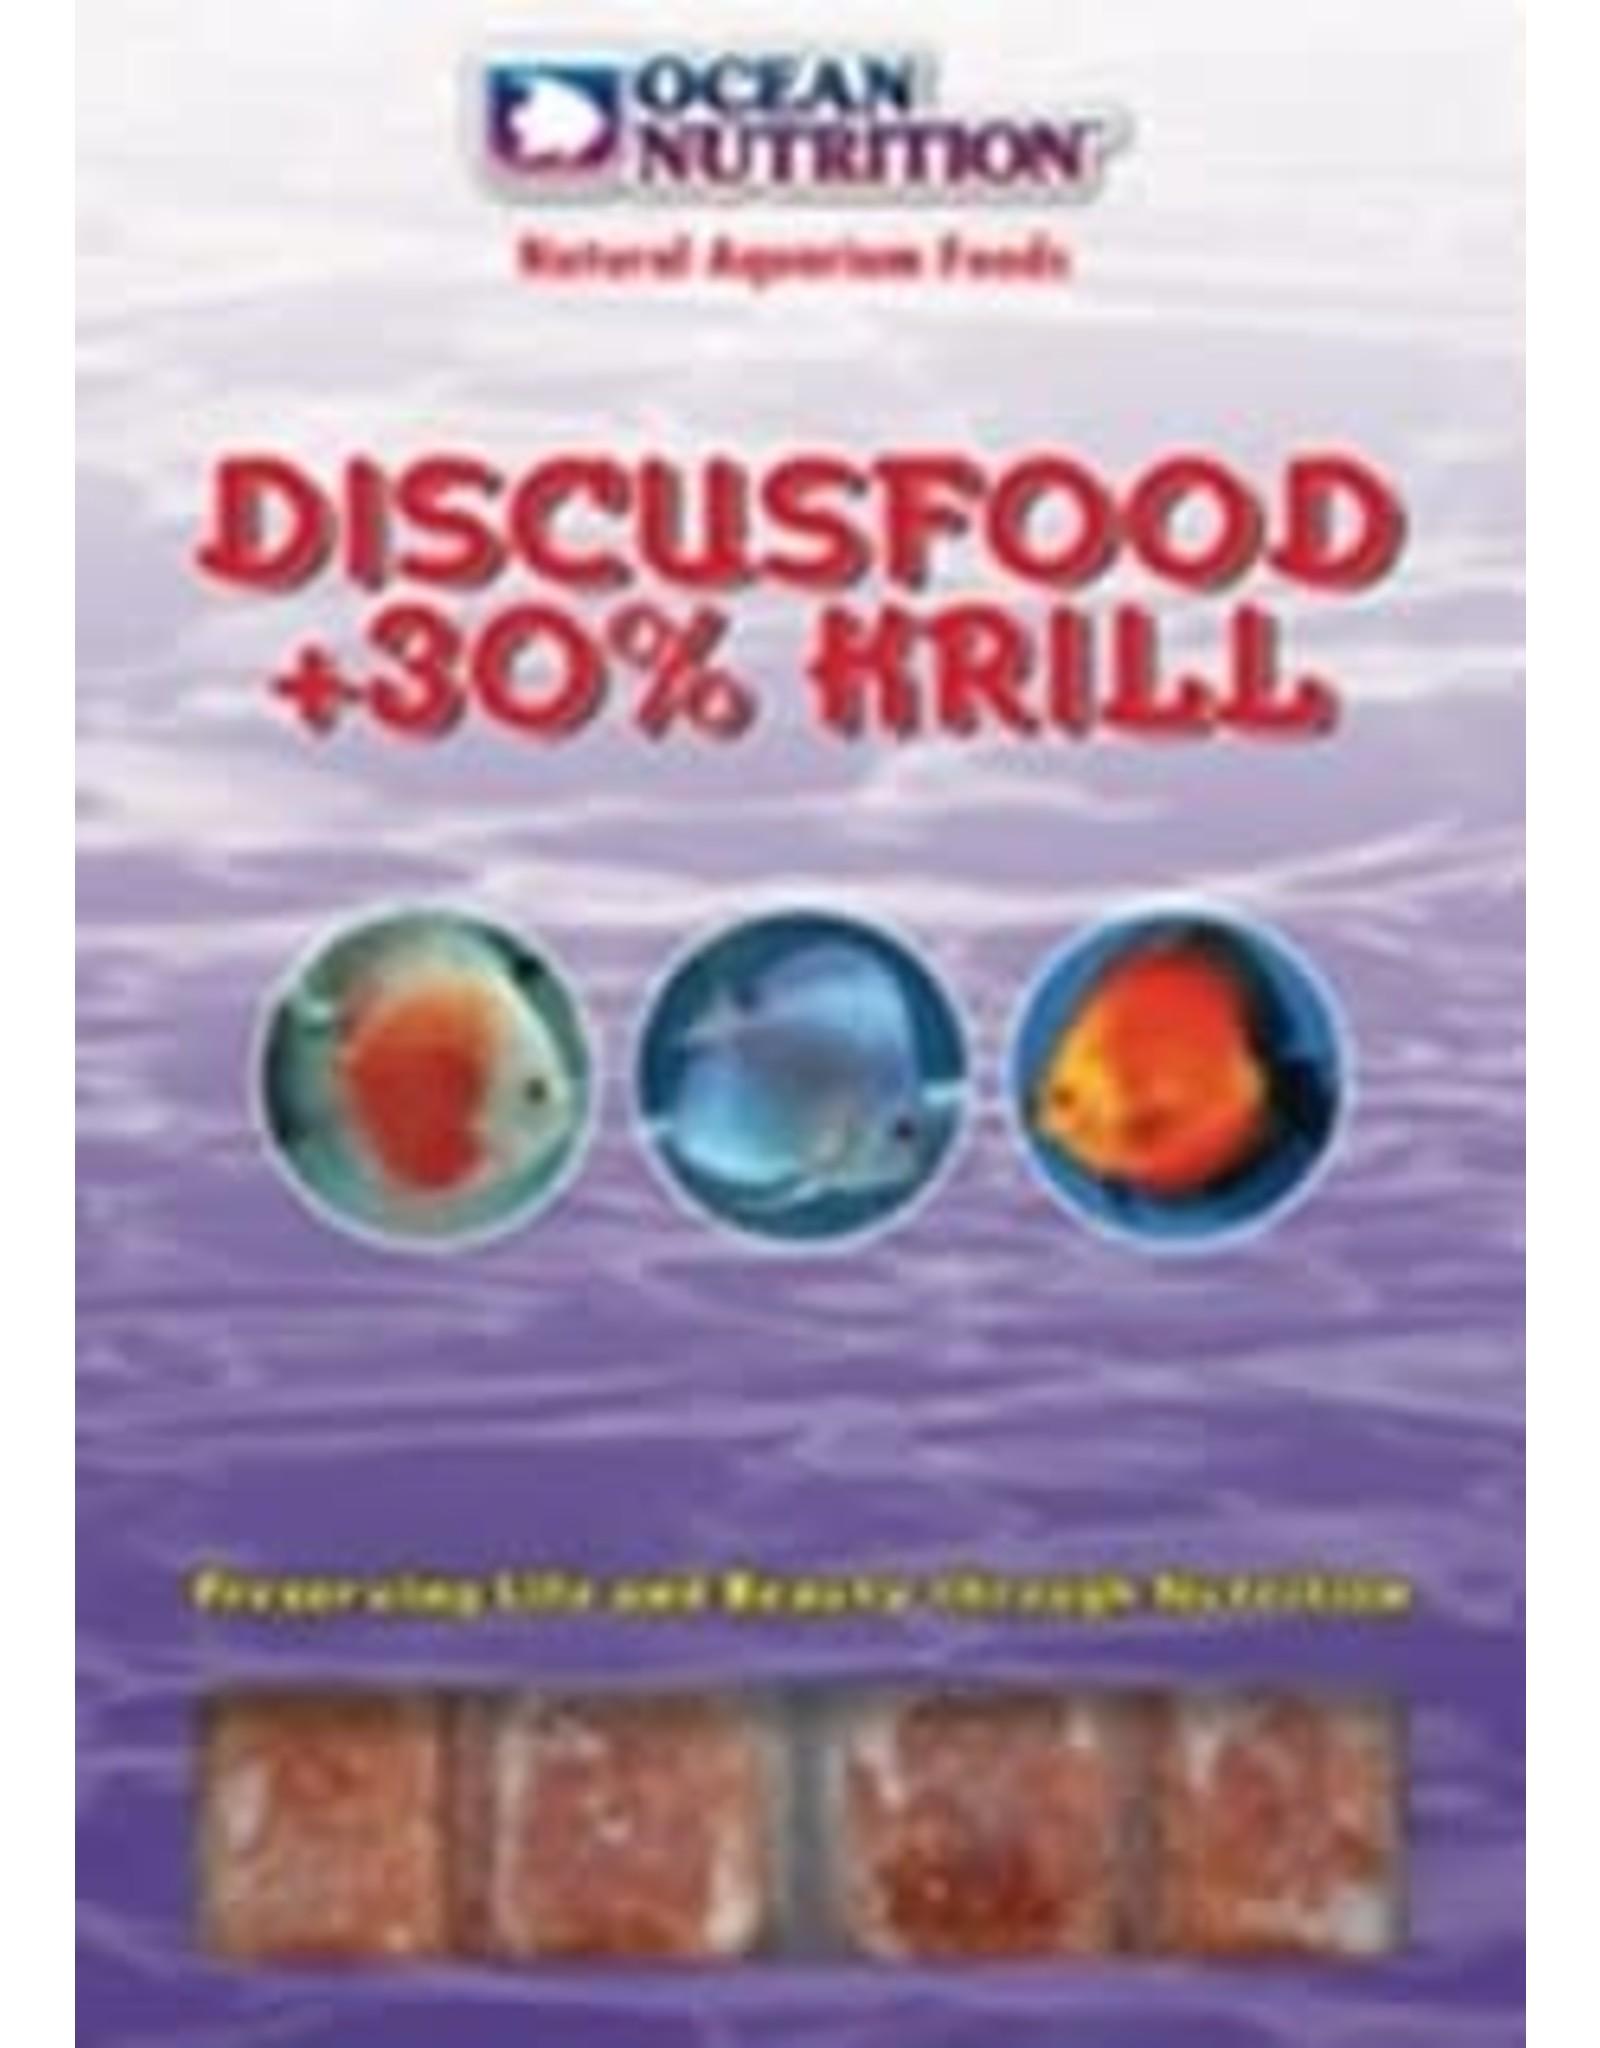 Ocean Nutrition discus food + 30% krill 100gr